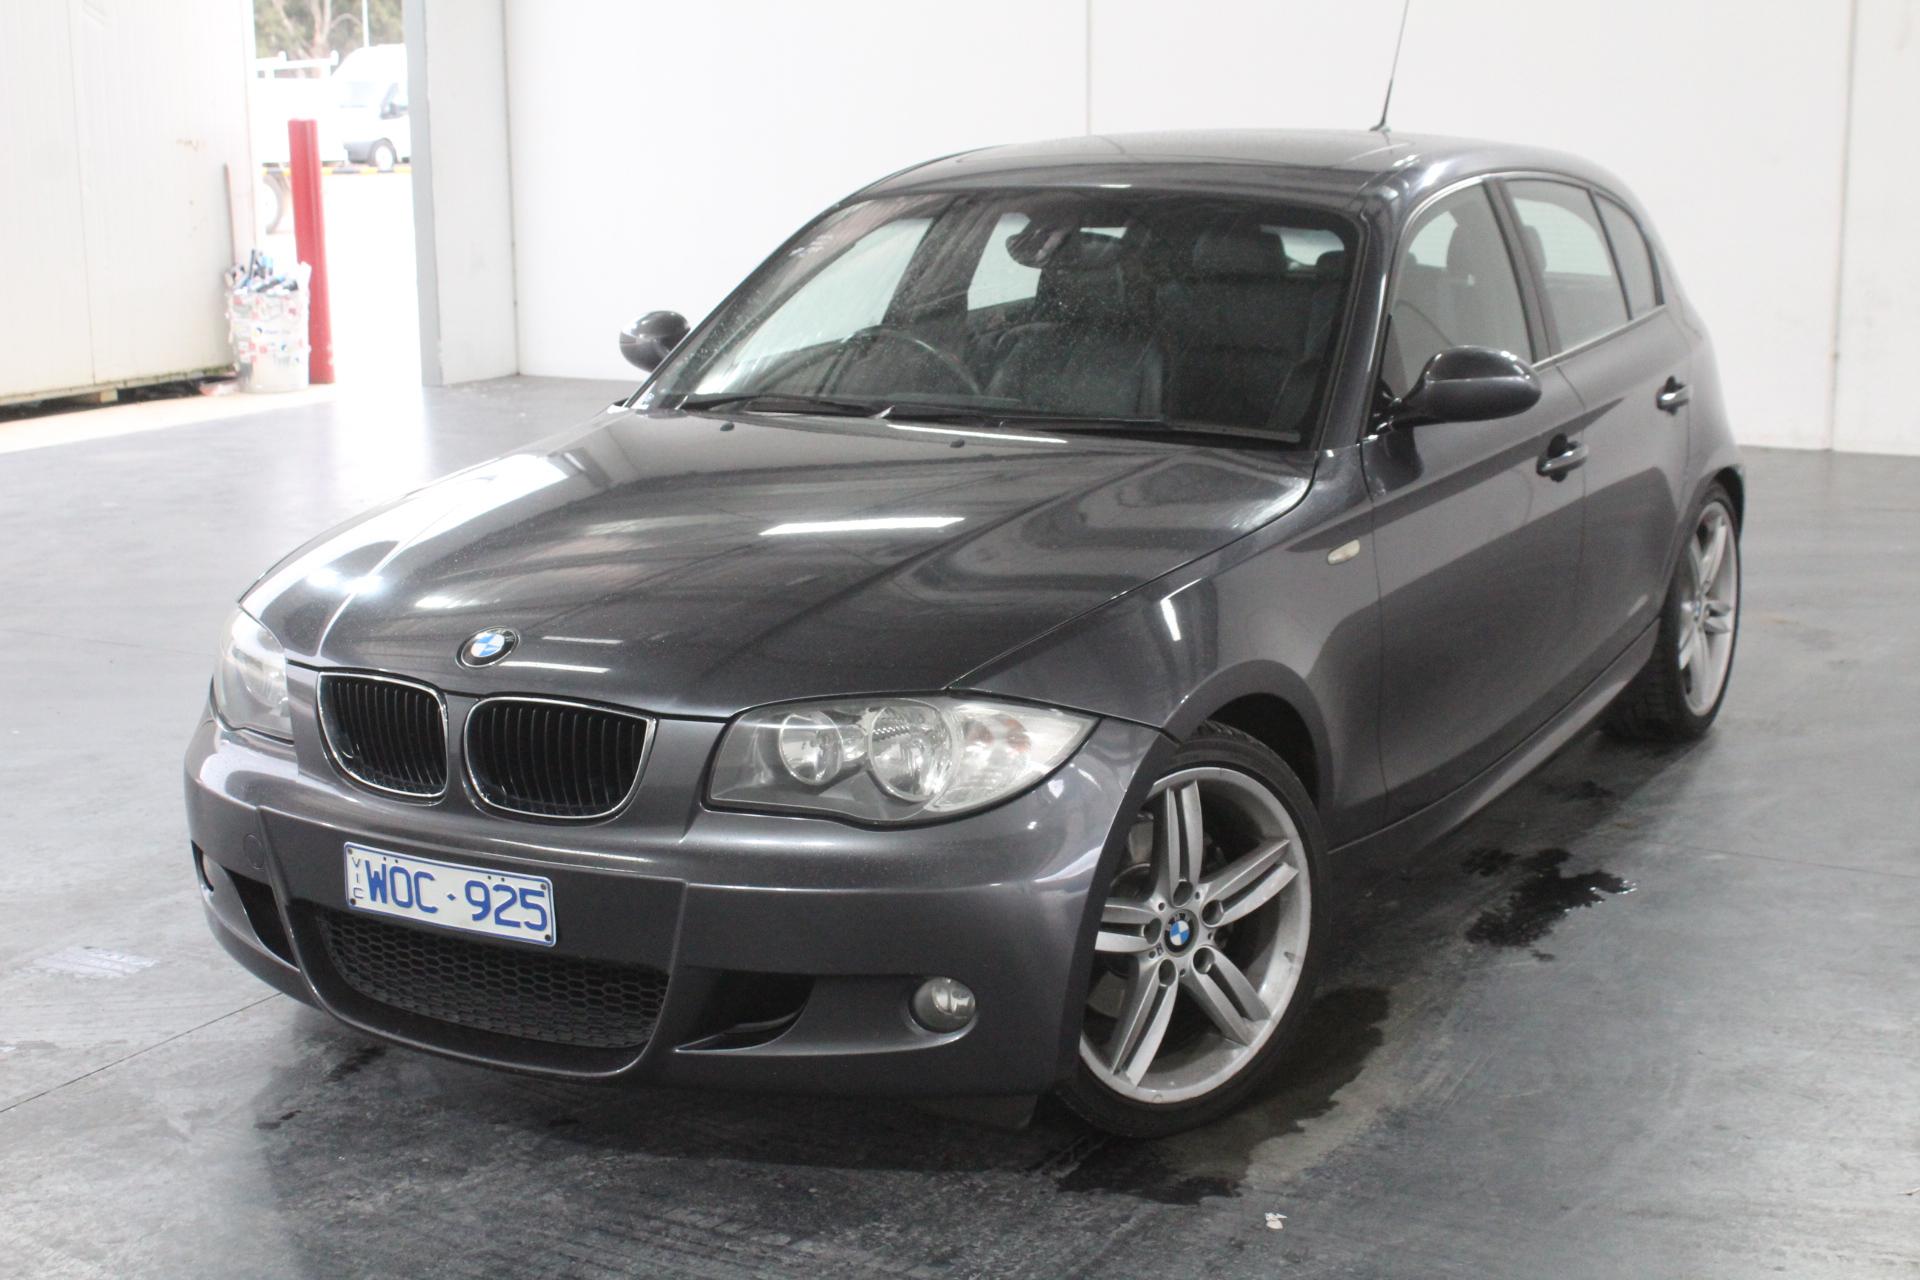 2008 BMW 1 20i E87 Automatic Hatchback